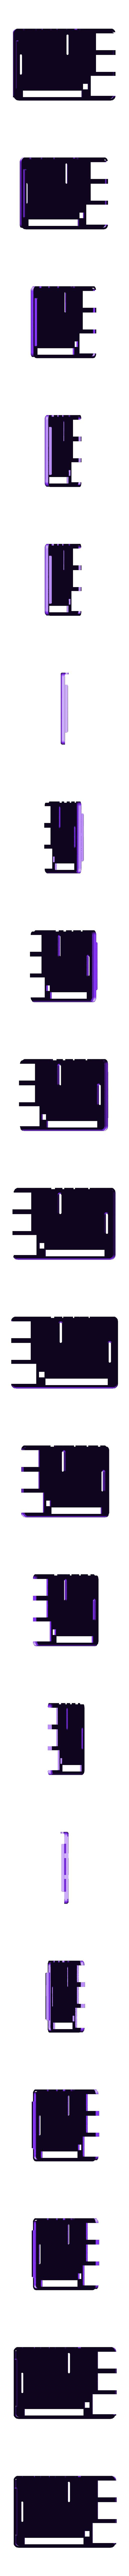 back-cover.stl Download free STL file Raspberry Pi HQ Camera Case • 3D print design, Adafruit